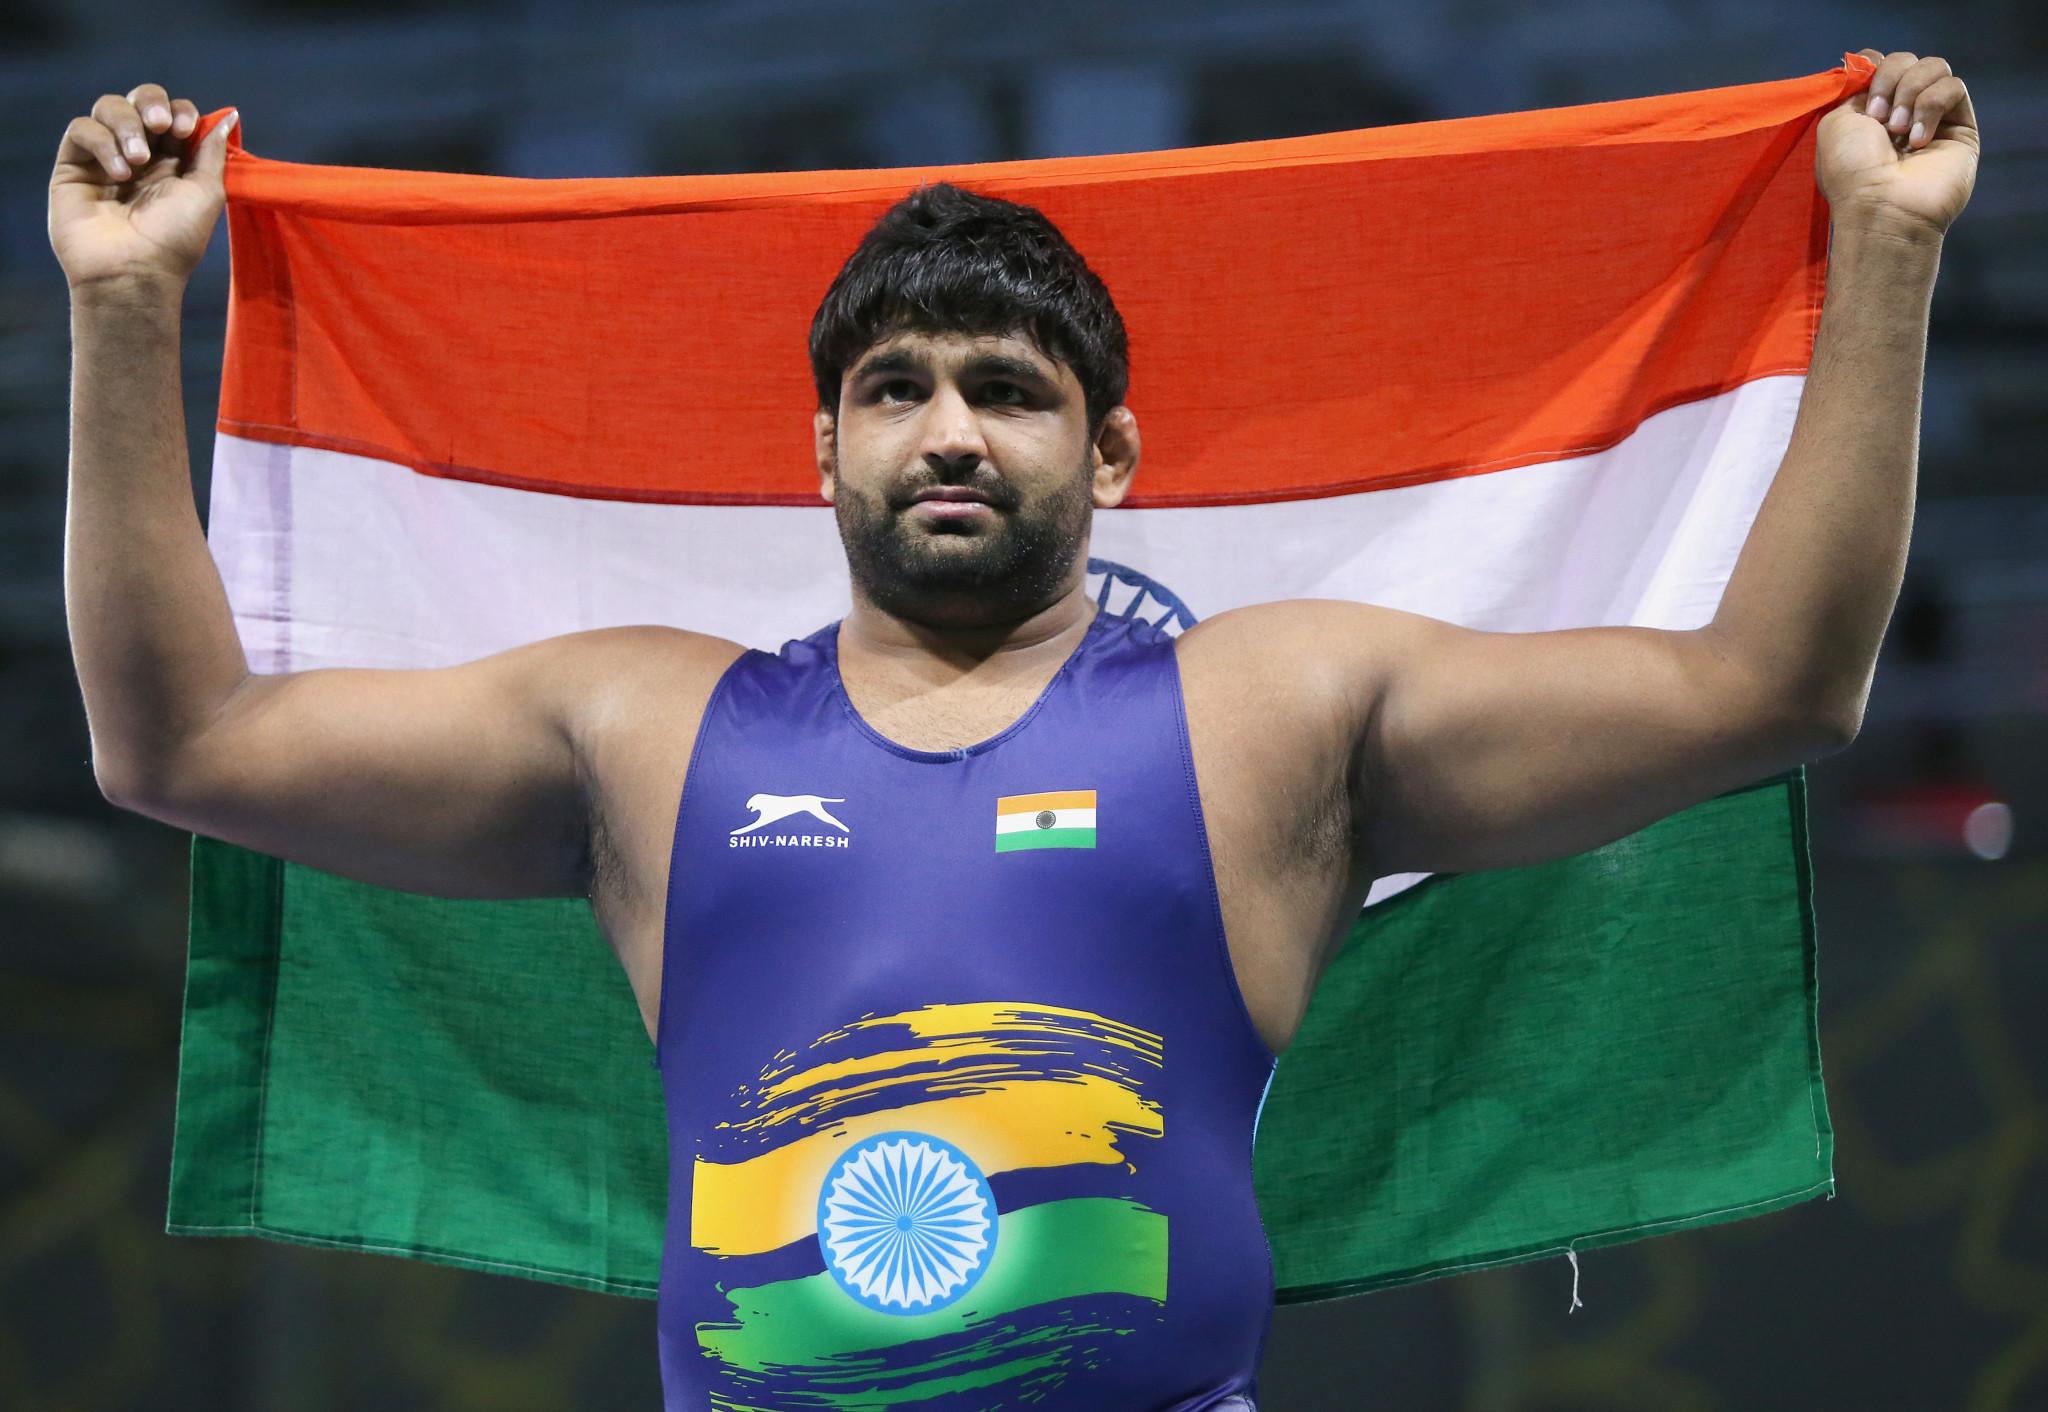 Commonwealth Games champion Malik seeking reduced doping ban to compete at Birmingham 2022